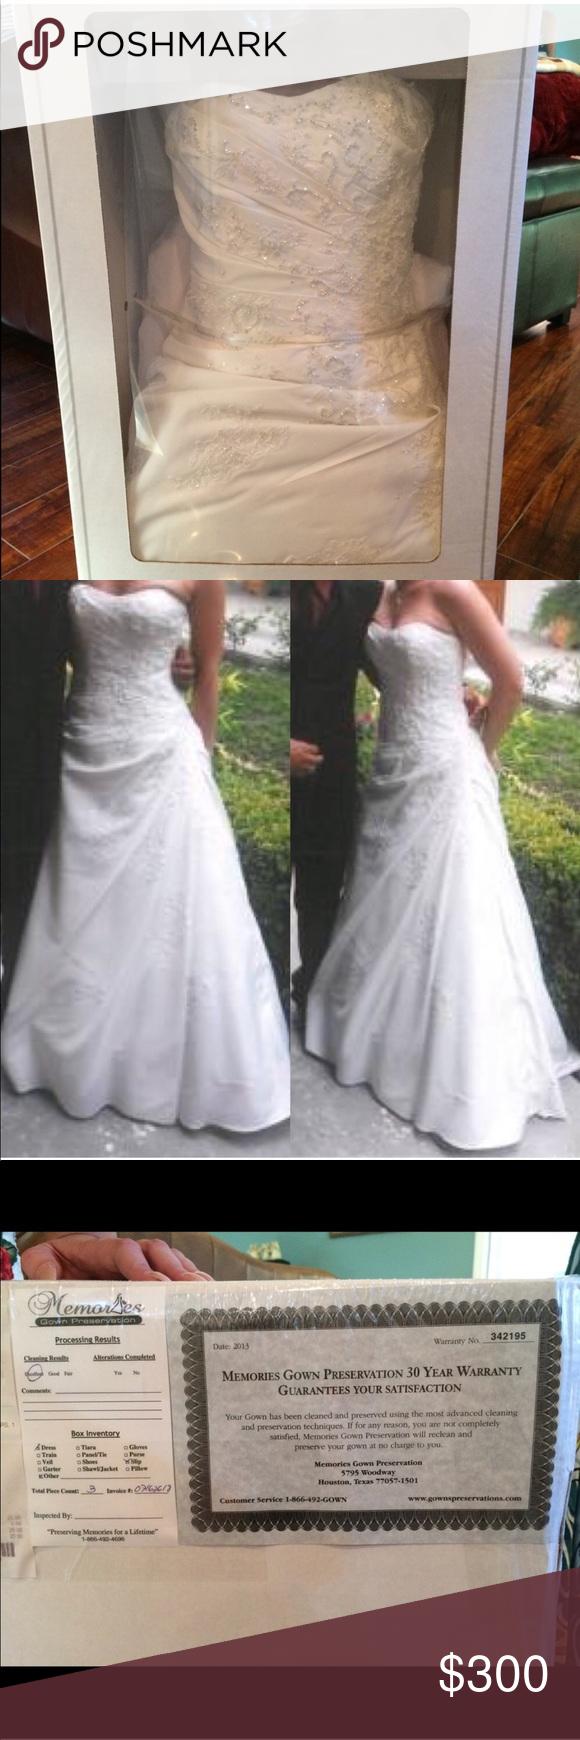 Davids Bridal Beaded Wedding Gown Size 4 | My Posh Picks | Pinterest ...